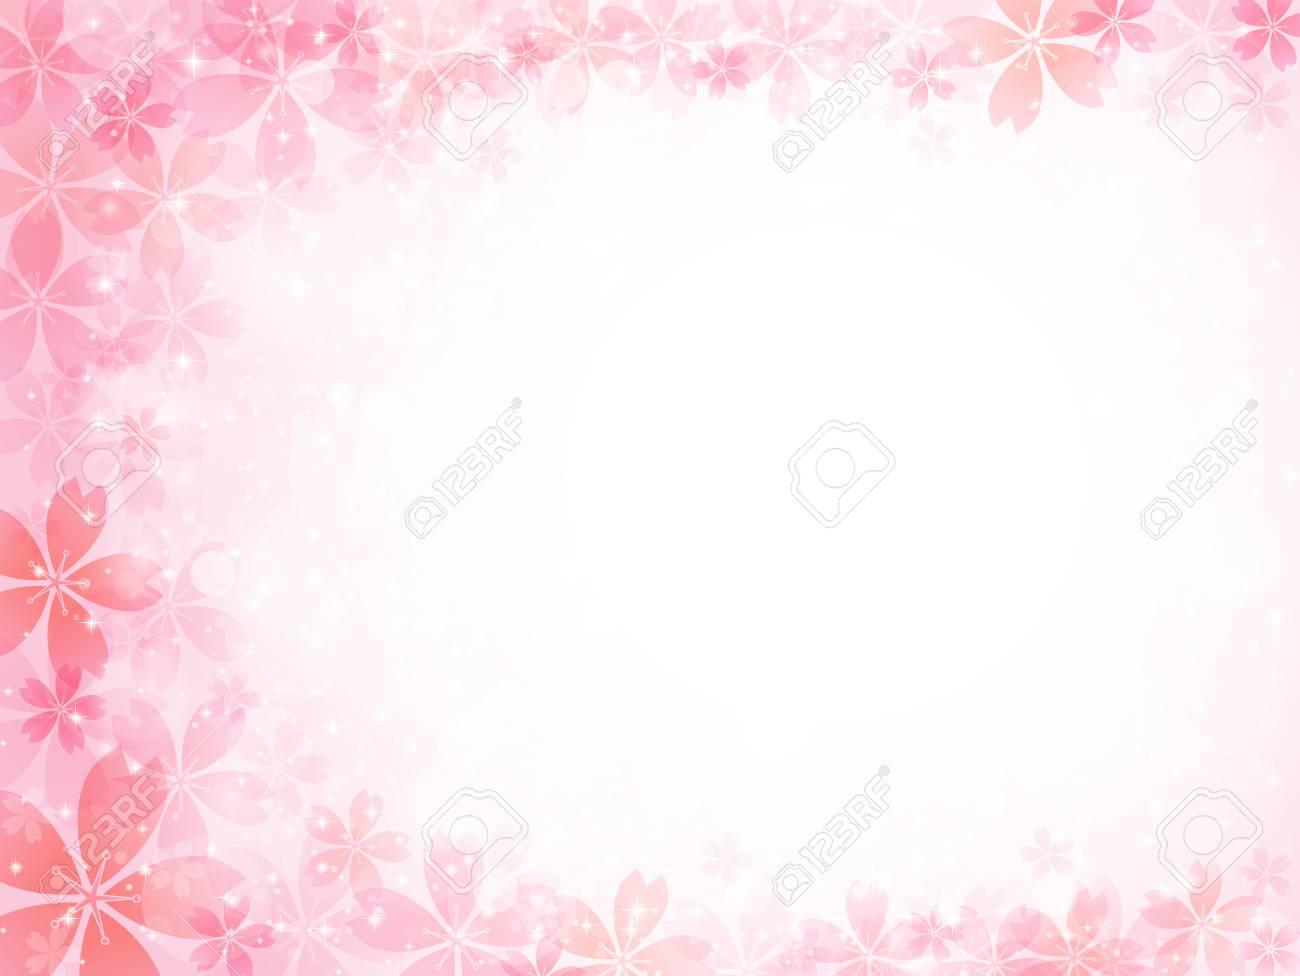 Cherry blossom background - 35161381